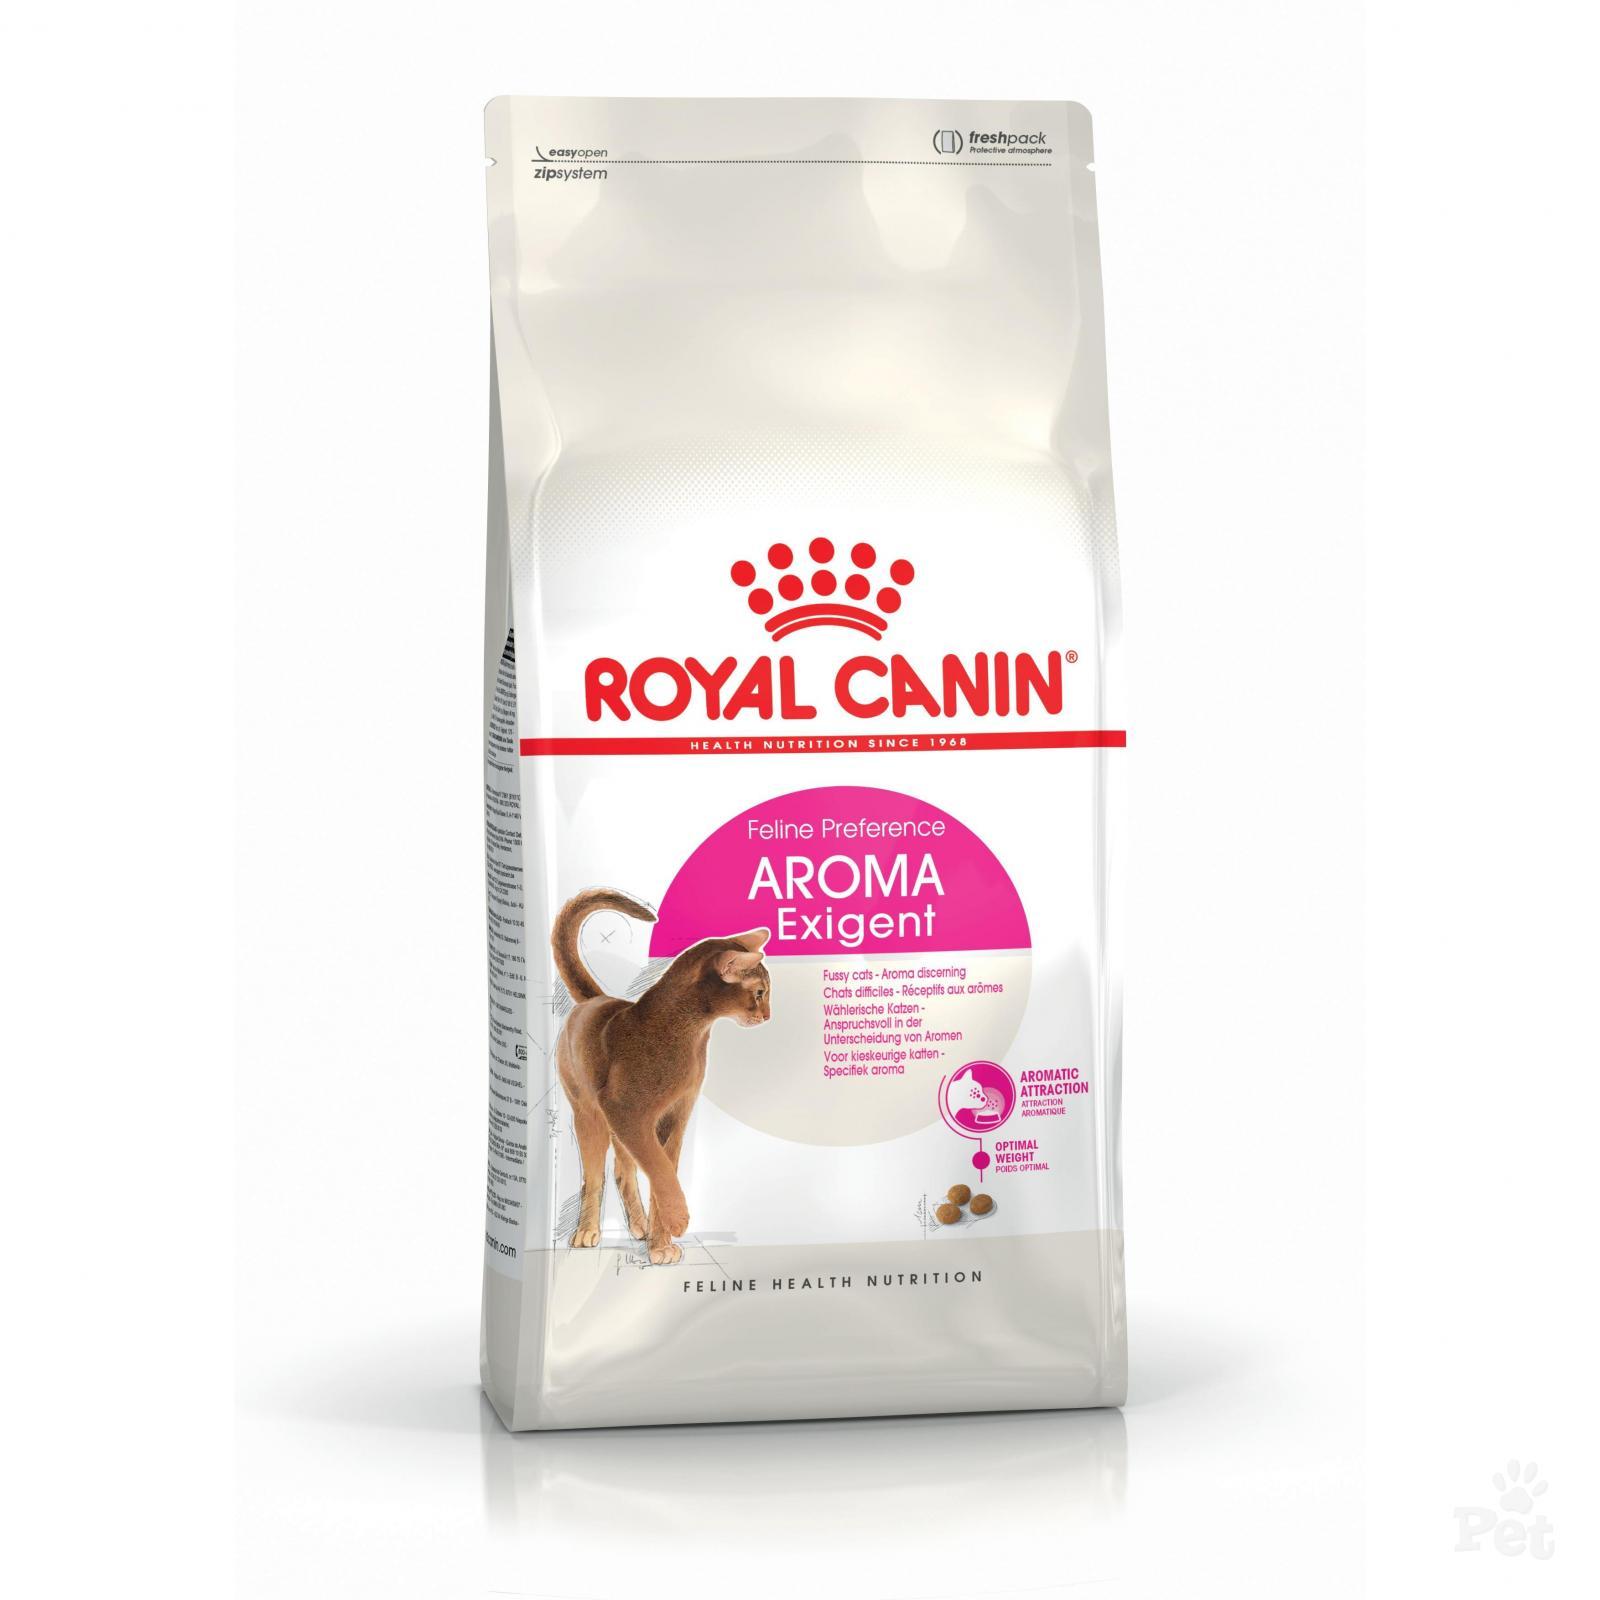 Kačių maistas Royal Canin Aroma Exigent 2kg.